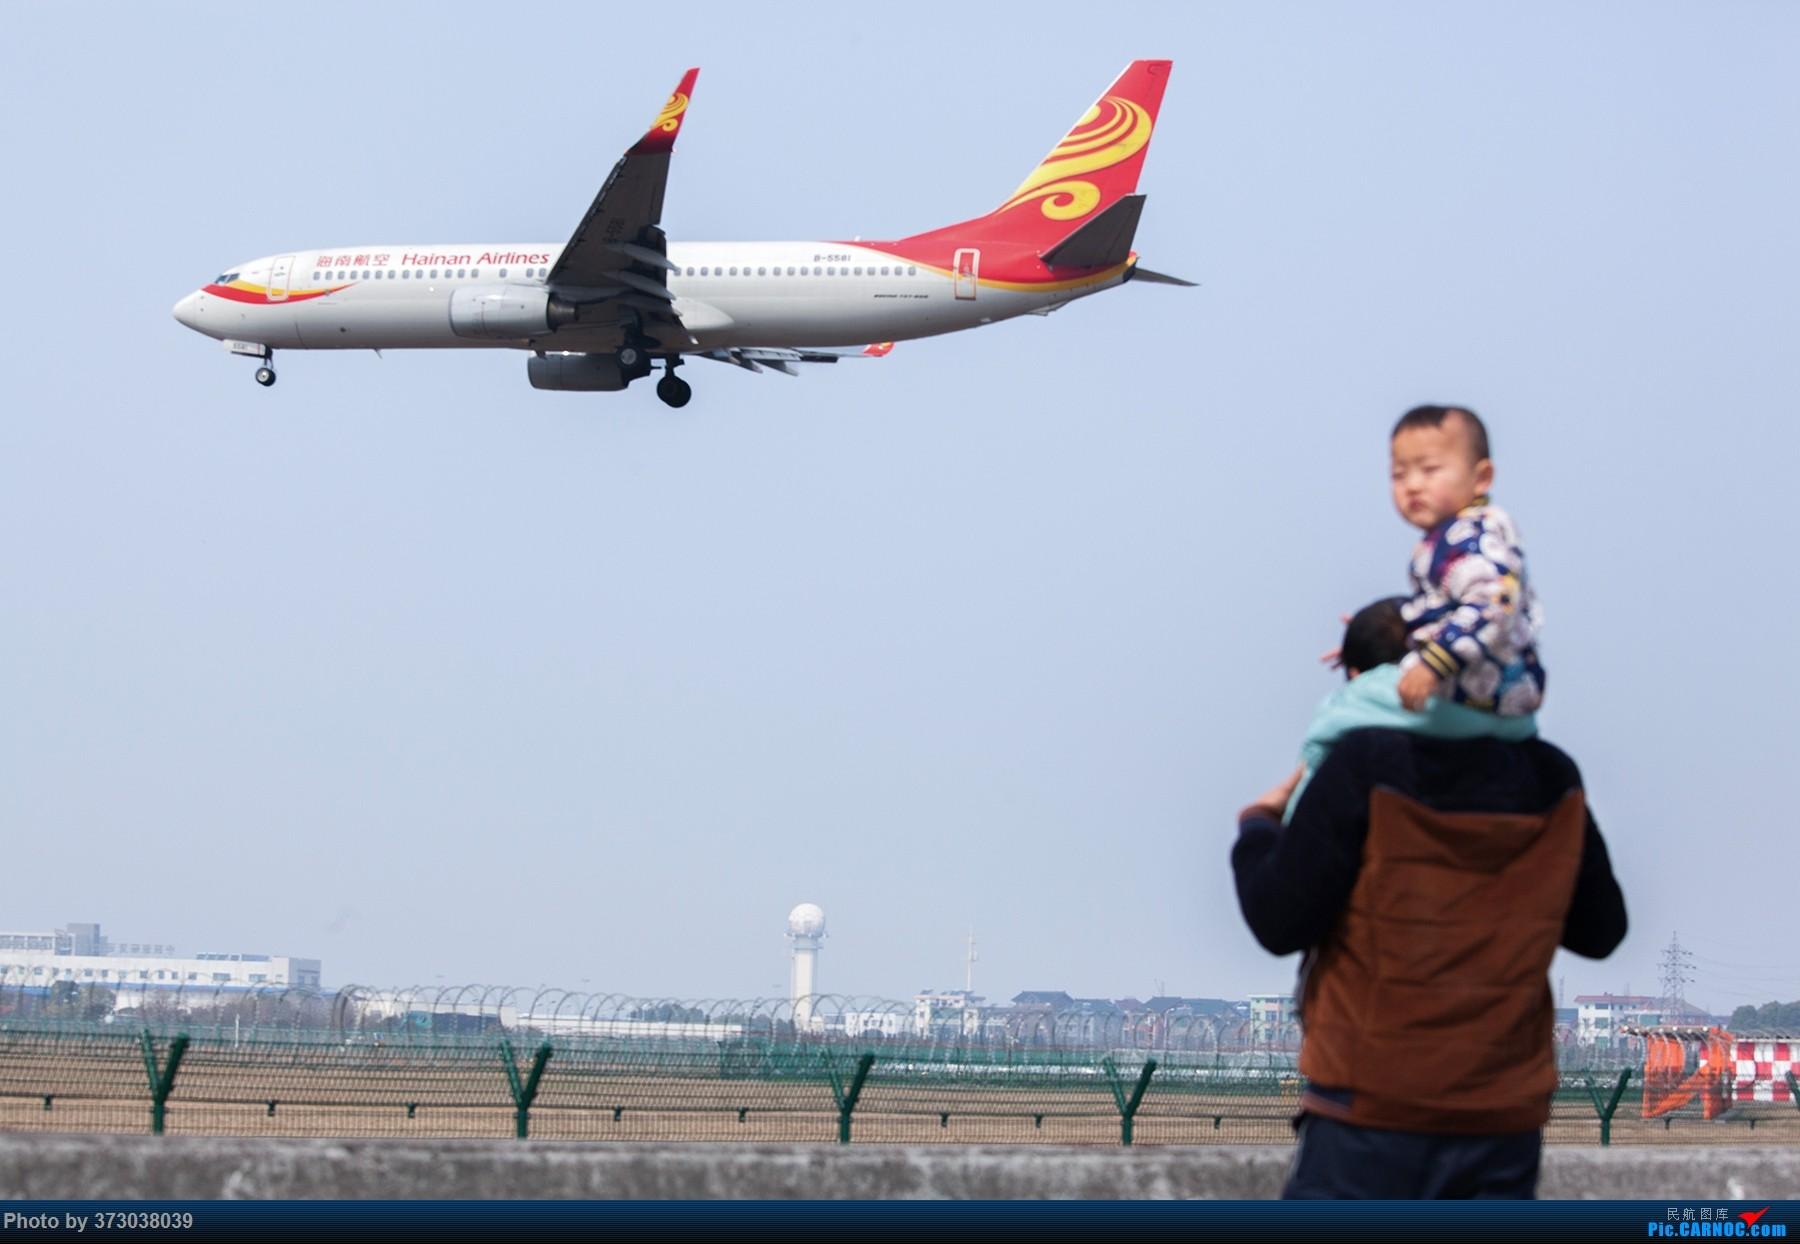 Re:[原创]【杭州飞友会】A320Neo迪士尼杭州萧山机场拍机班门弄斧记 BOEING 737-800 B-5581 中国杭州萧山国际机场